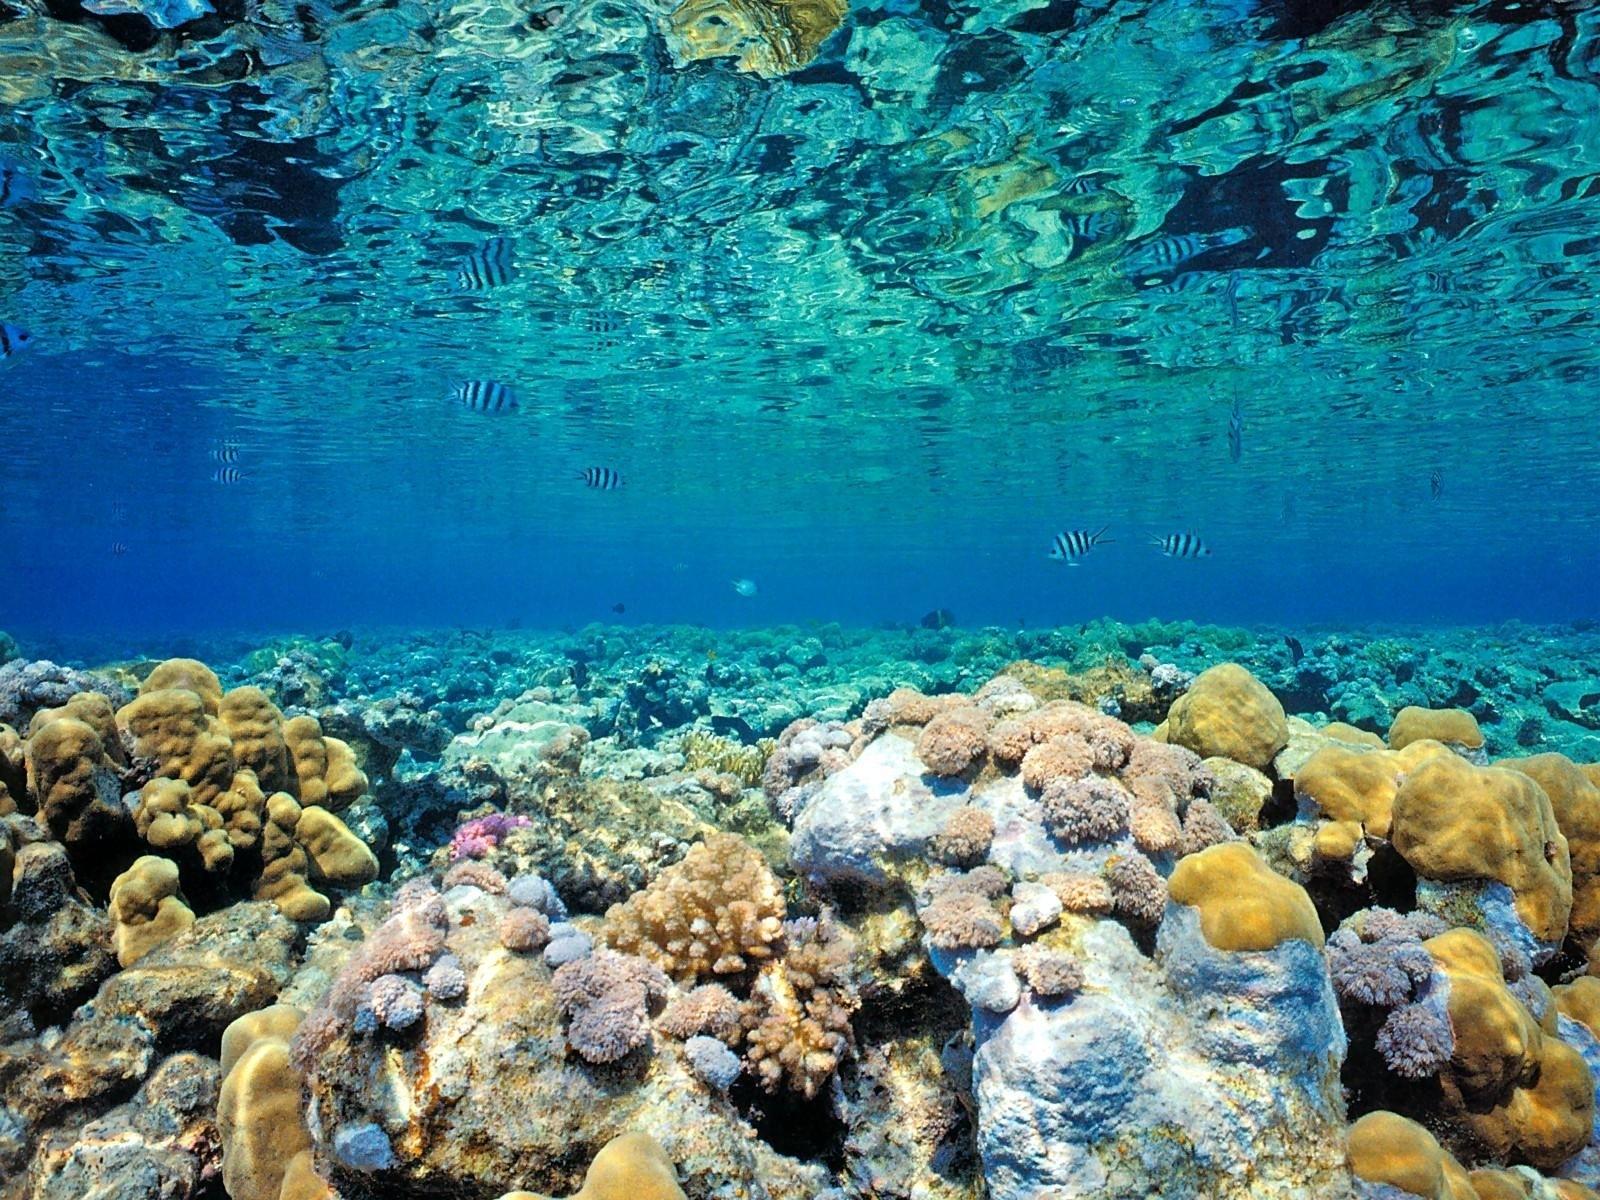 reef wallpaper hd resolution #mzx | earth | pinterest | wallpaper